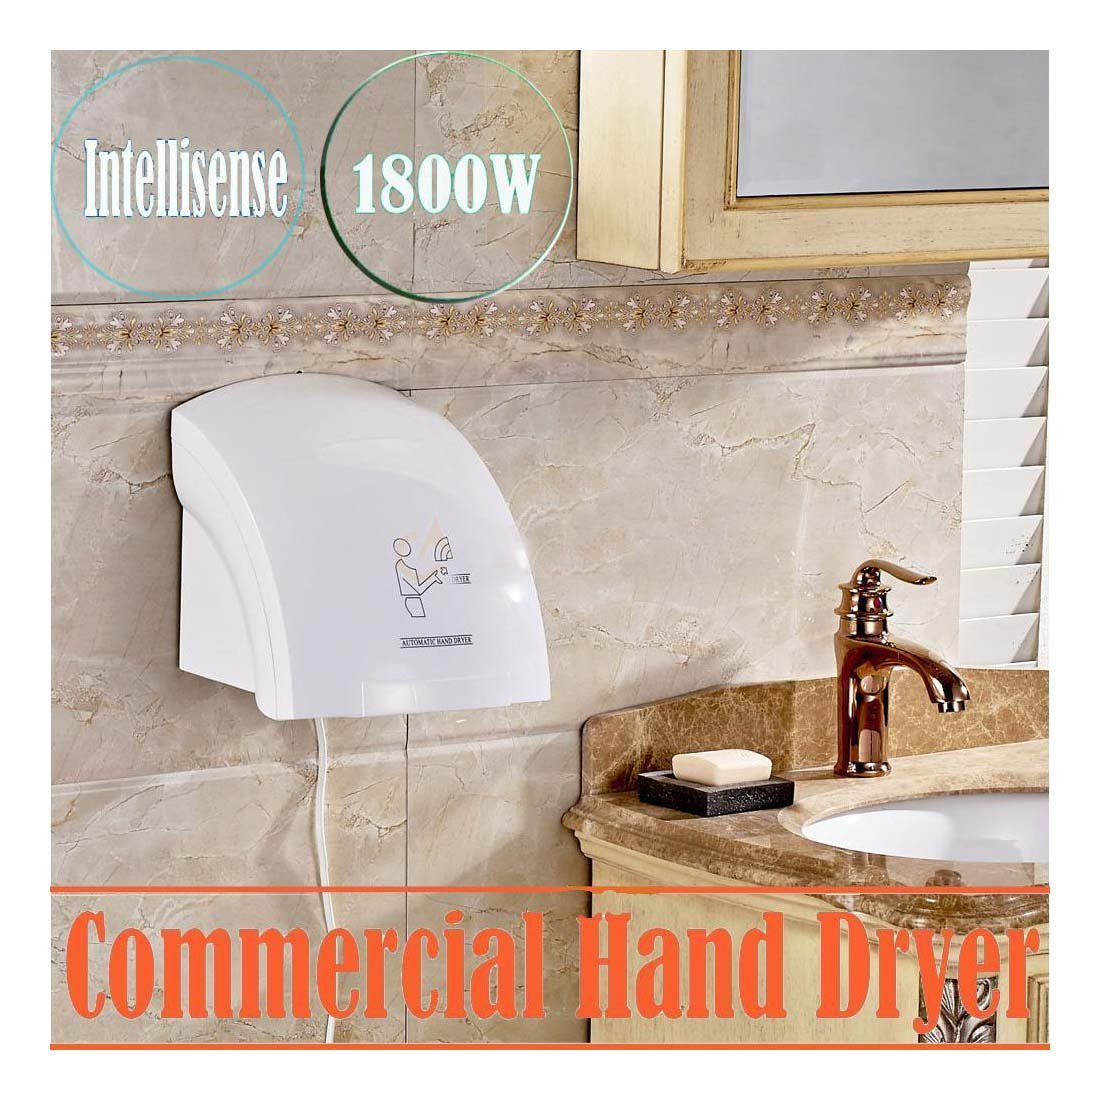 Hotel Automatic Infared Sensor Hand Dryer Household Bathroom Hands Drying Device -Sensor Distance:5.91'' / 15cm